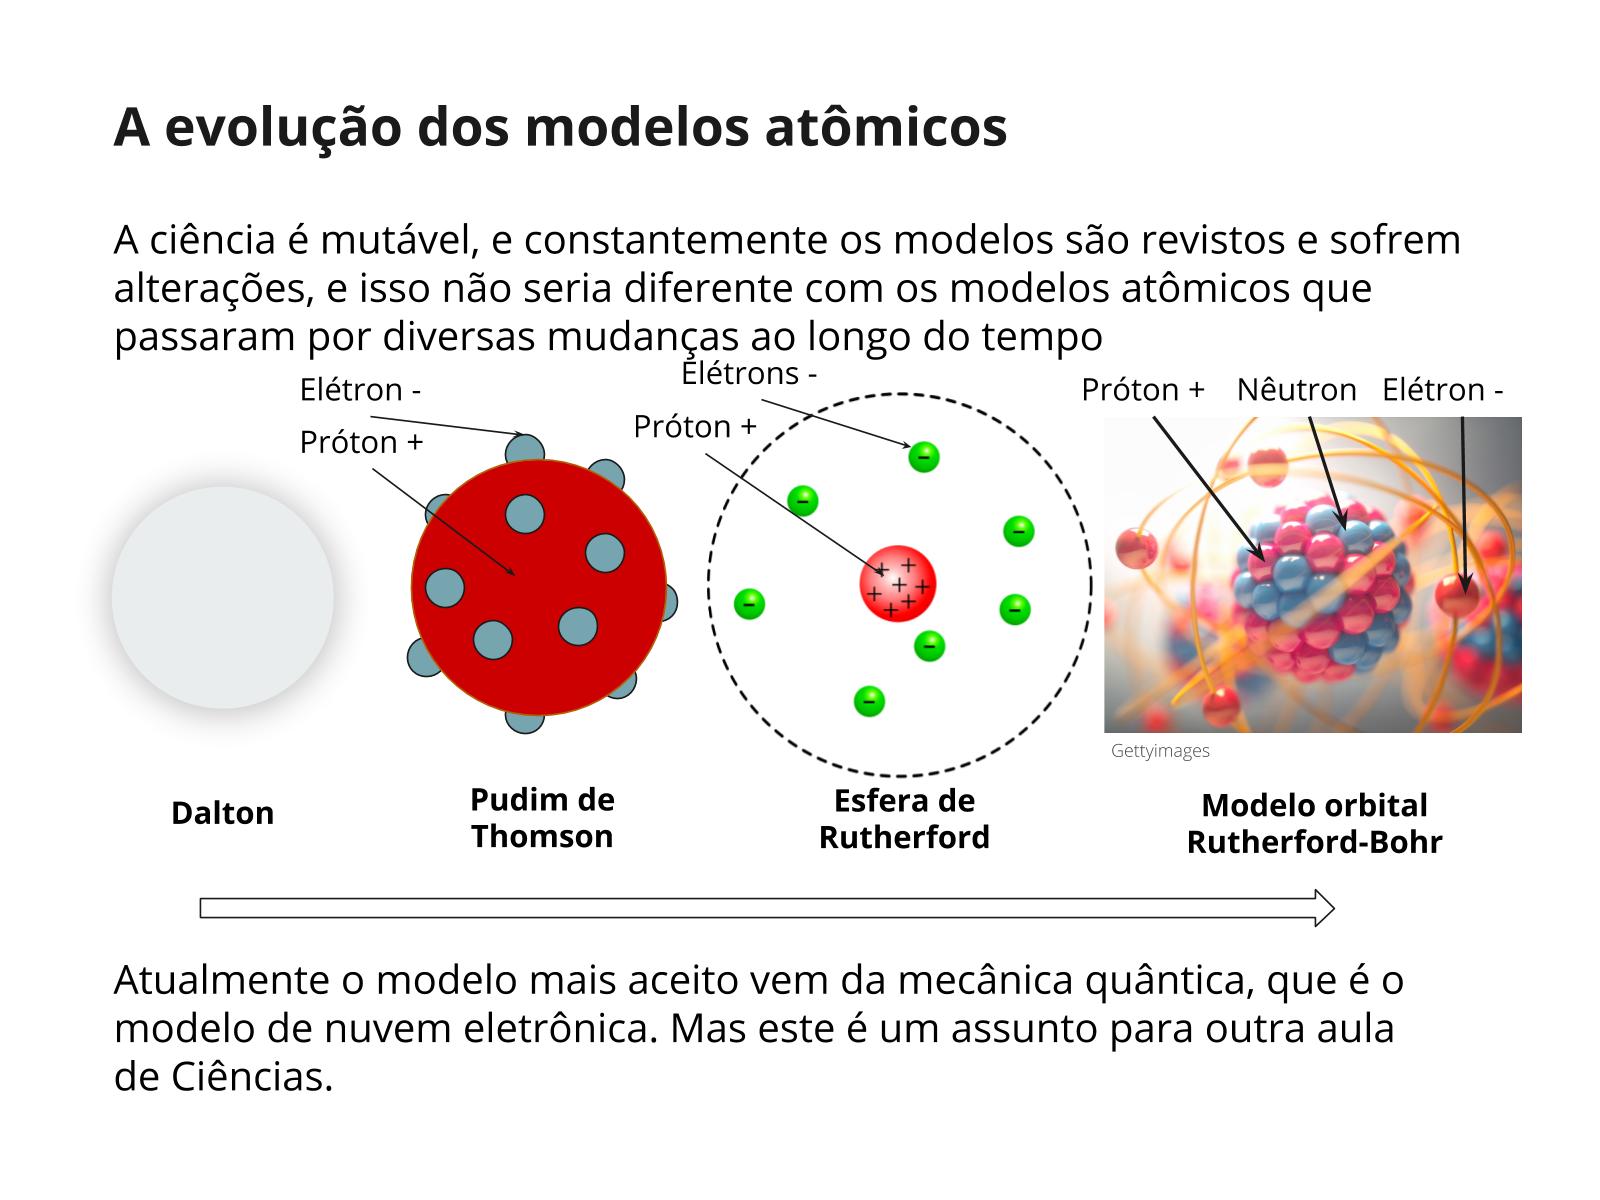 Ensinar modelos que descrevem a estrutura do átomo